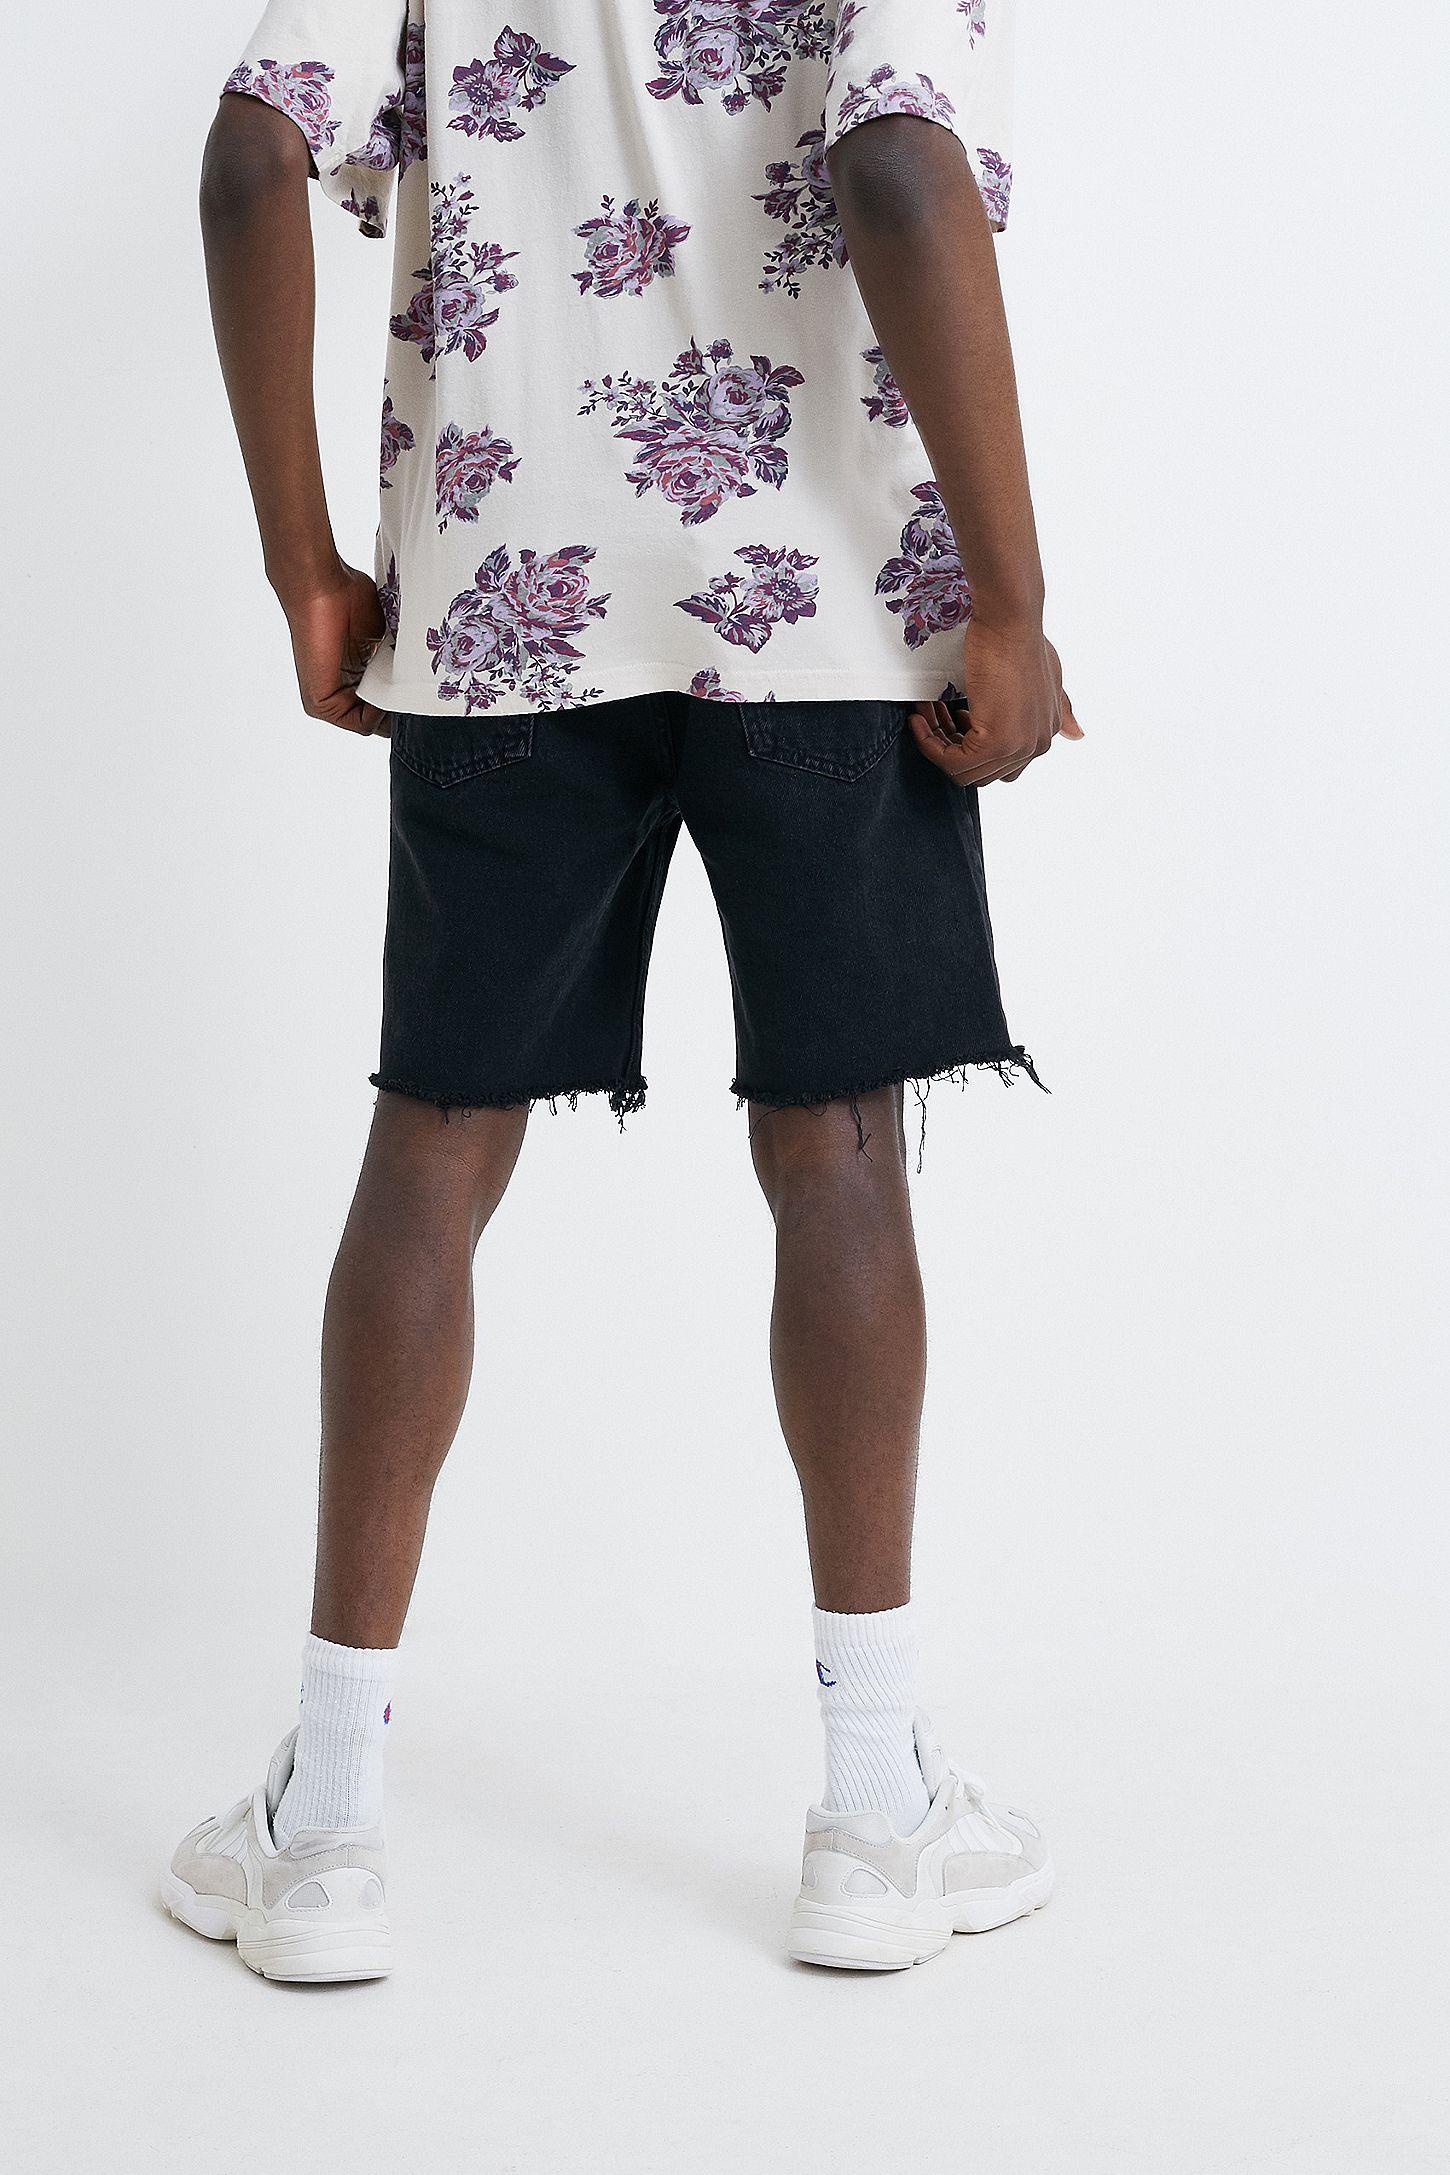 105713d154f6 Slide View  4  BDG Dad True Black Denim Shorts